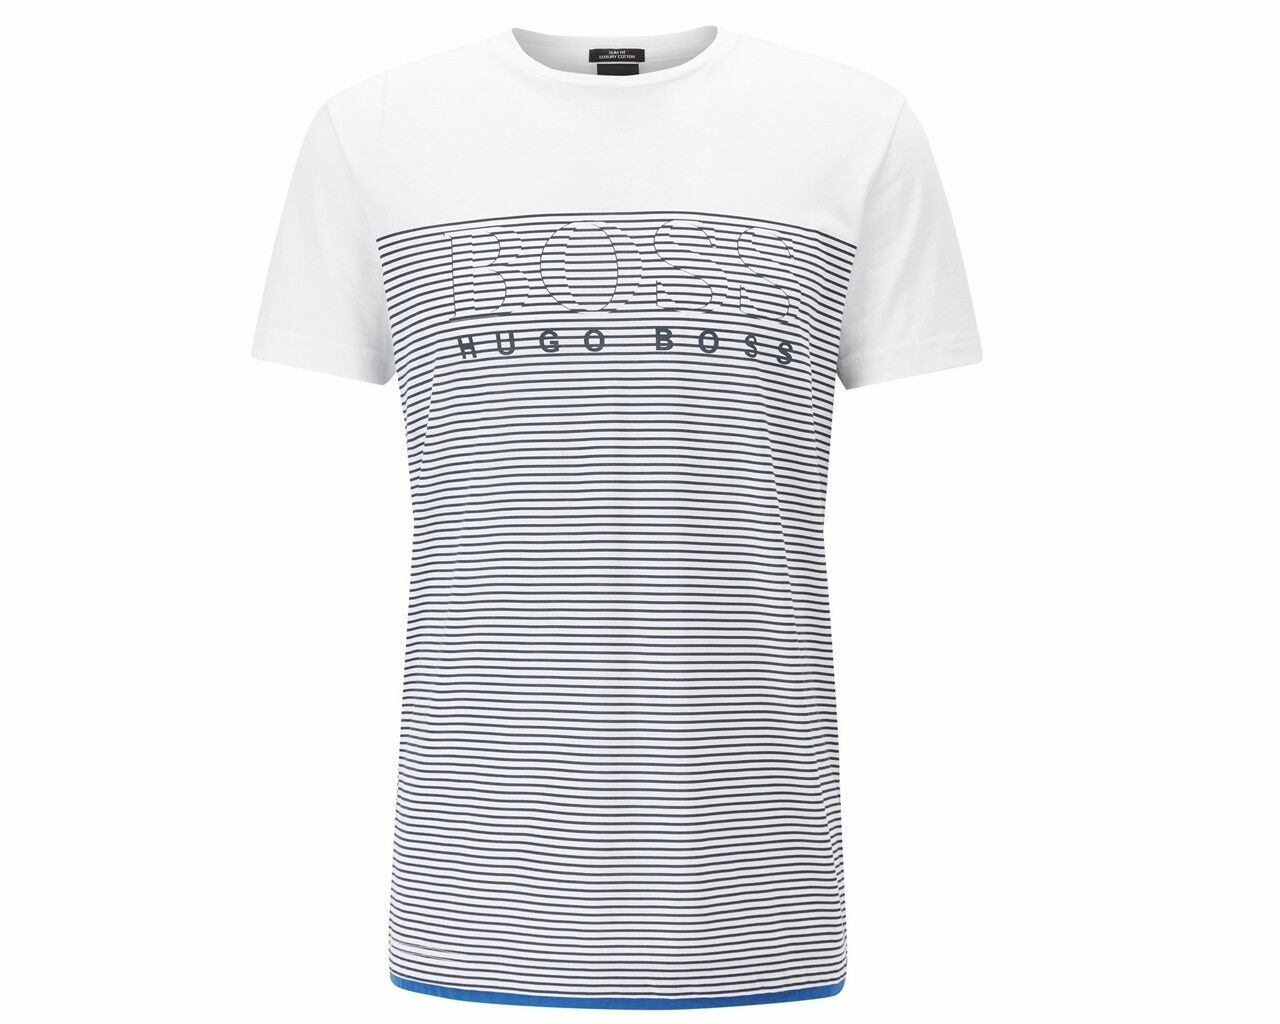 Hugo Boss schwarz Teep 11 50384082 100 kurzärmelig Herren T-Shirt weiße